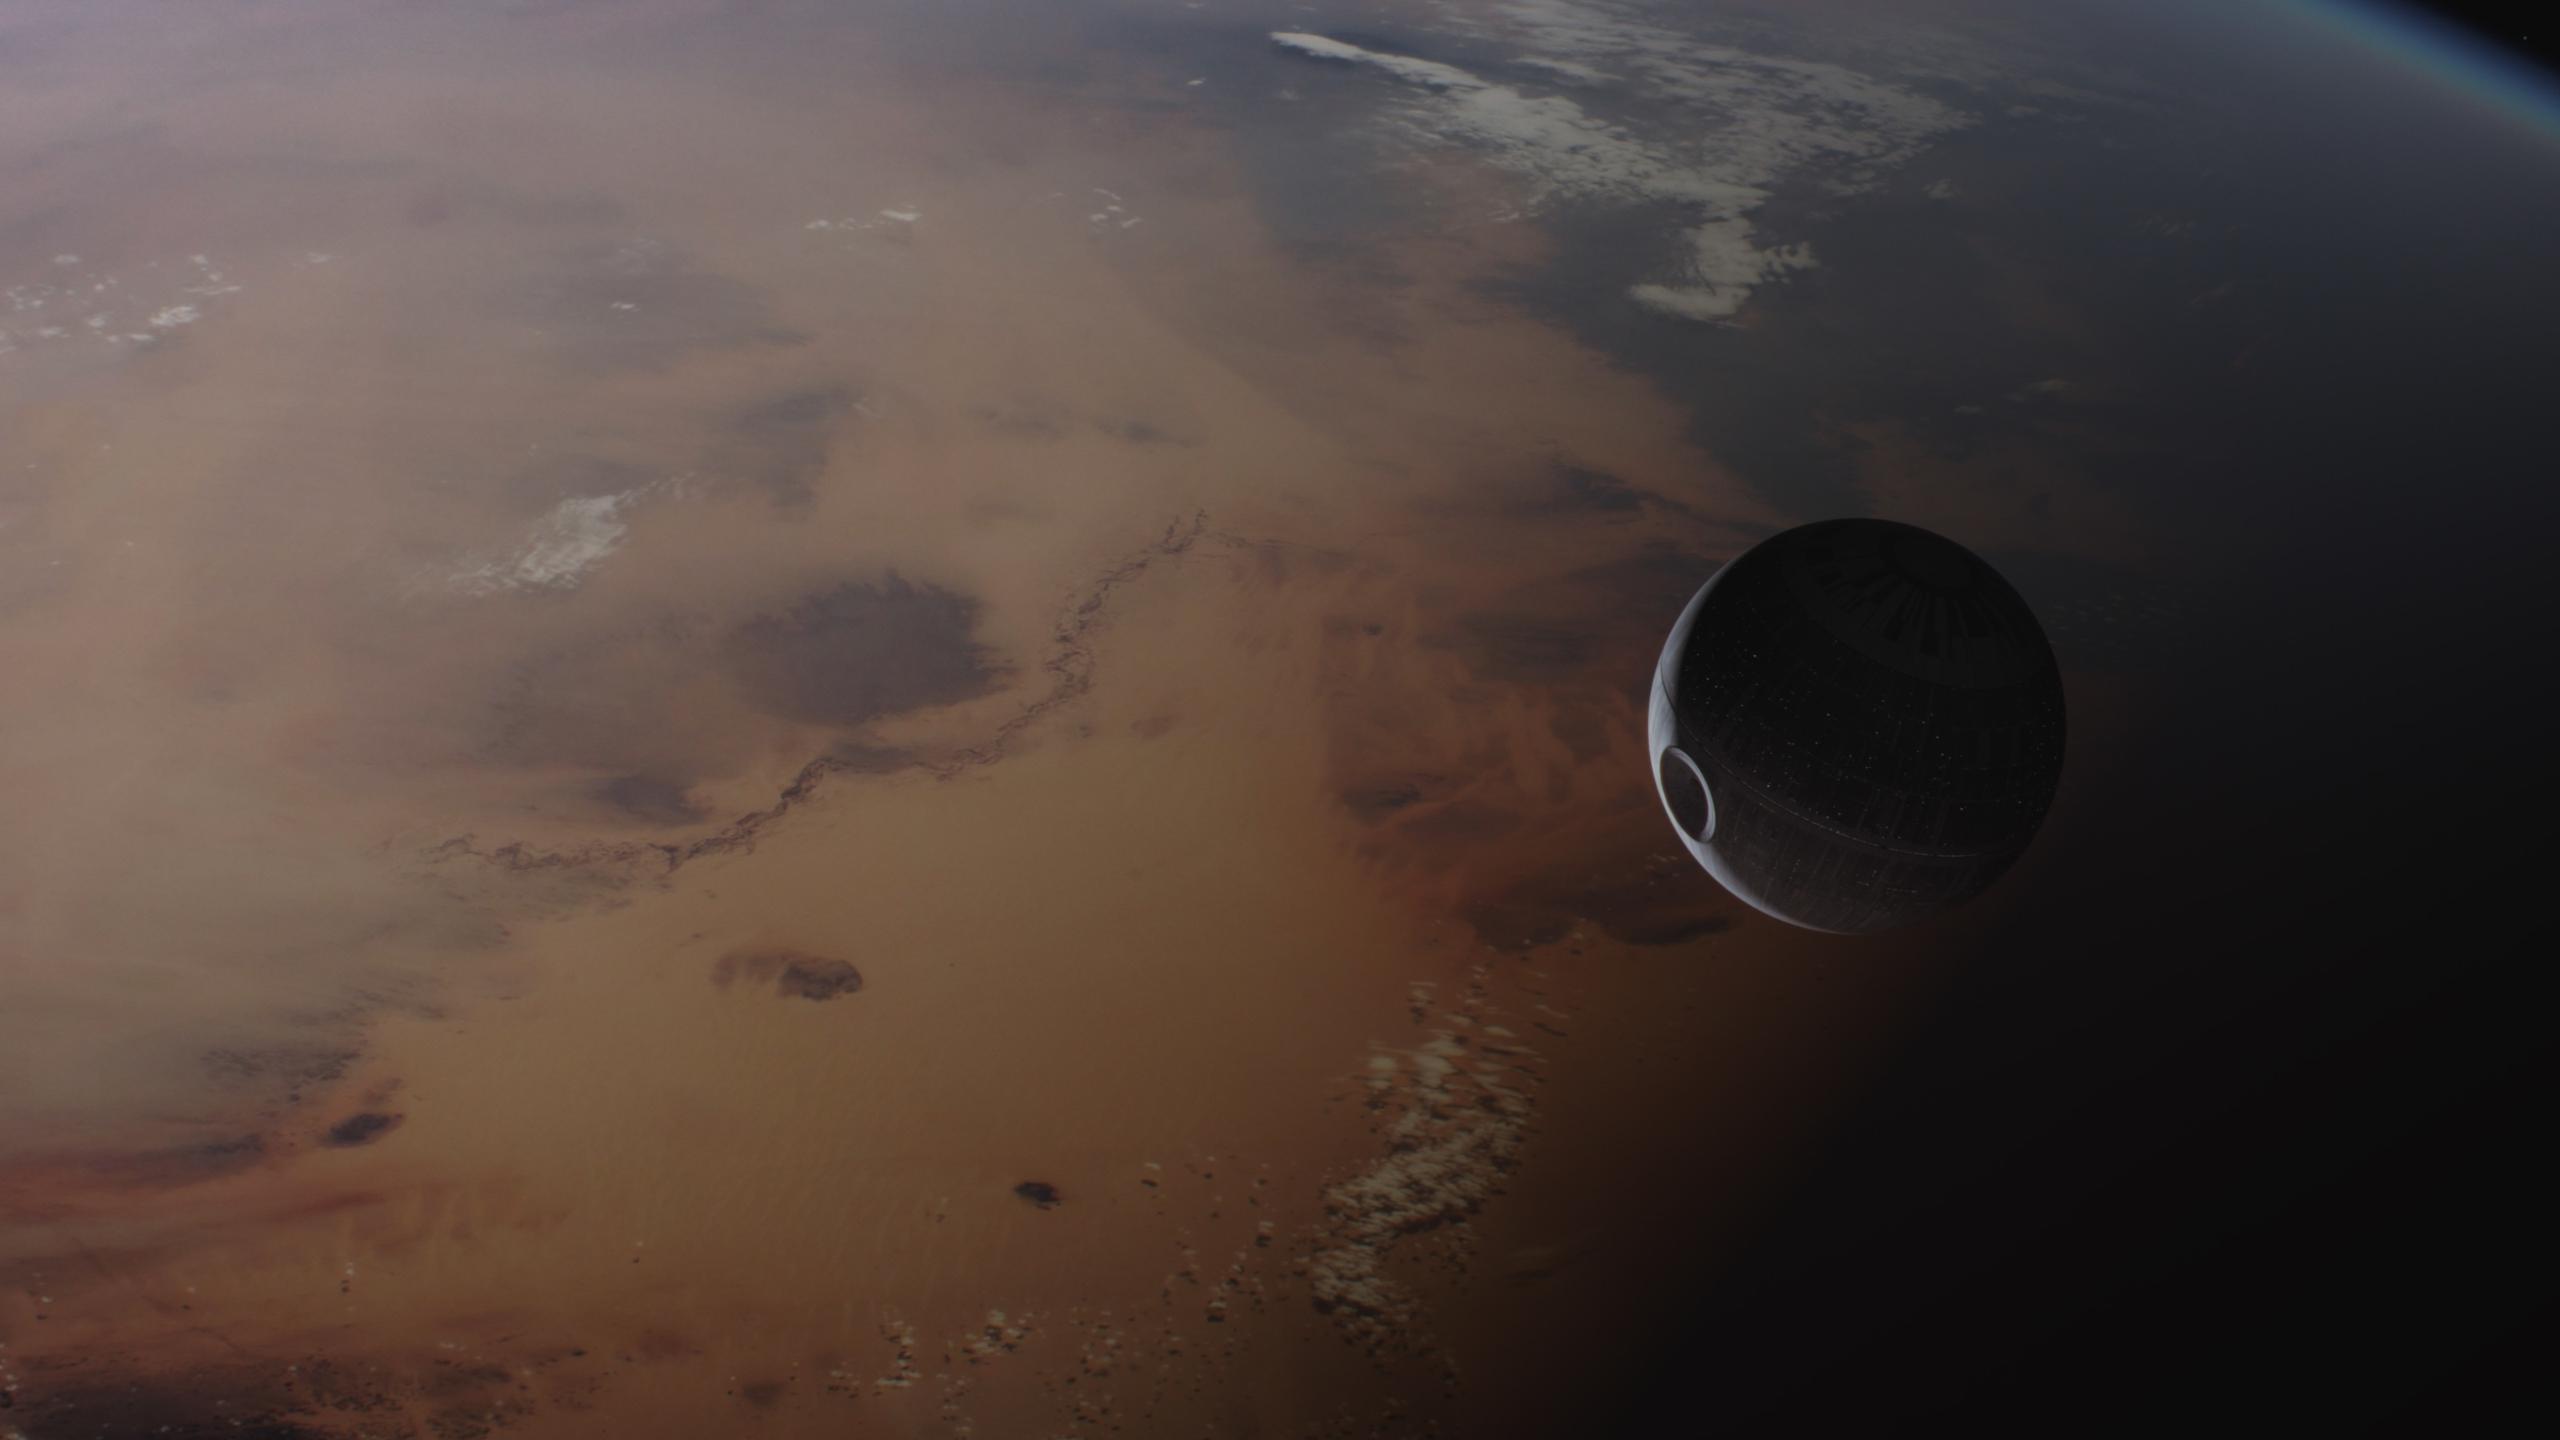 Wallpaper Star Wars Death Star Space Orbital View Rogue One A Star Wars Story 2560x1440 Flamespeedy 1892947 Hd Wallpapers Wallhere